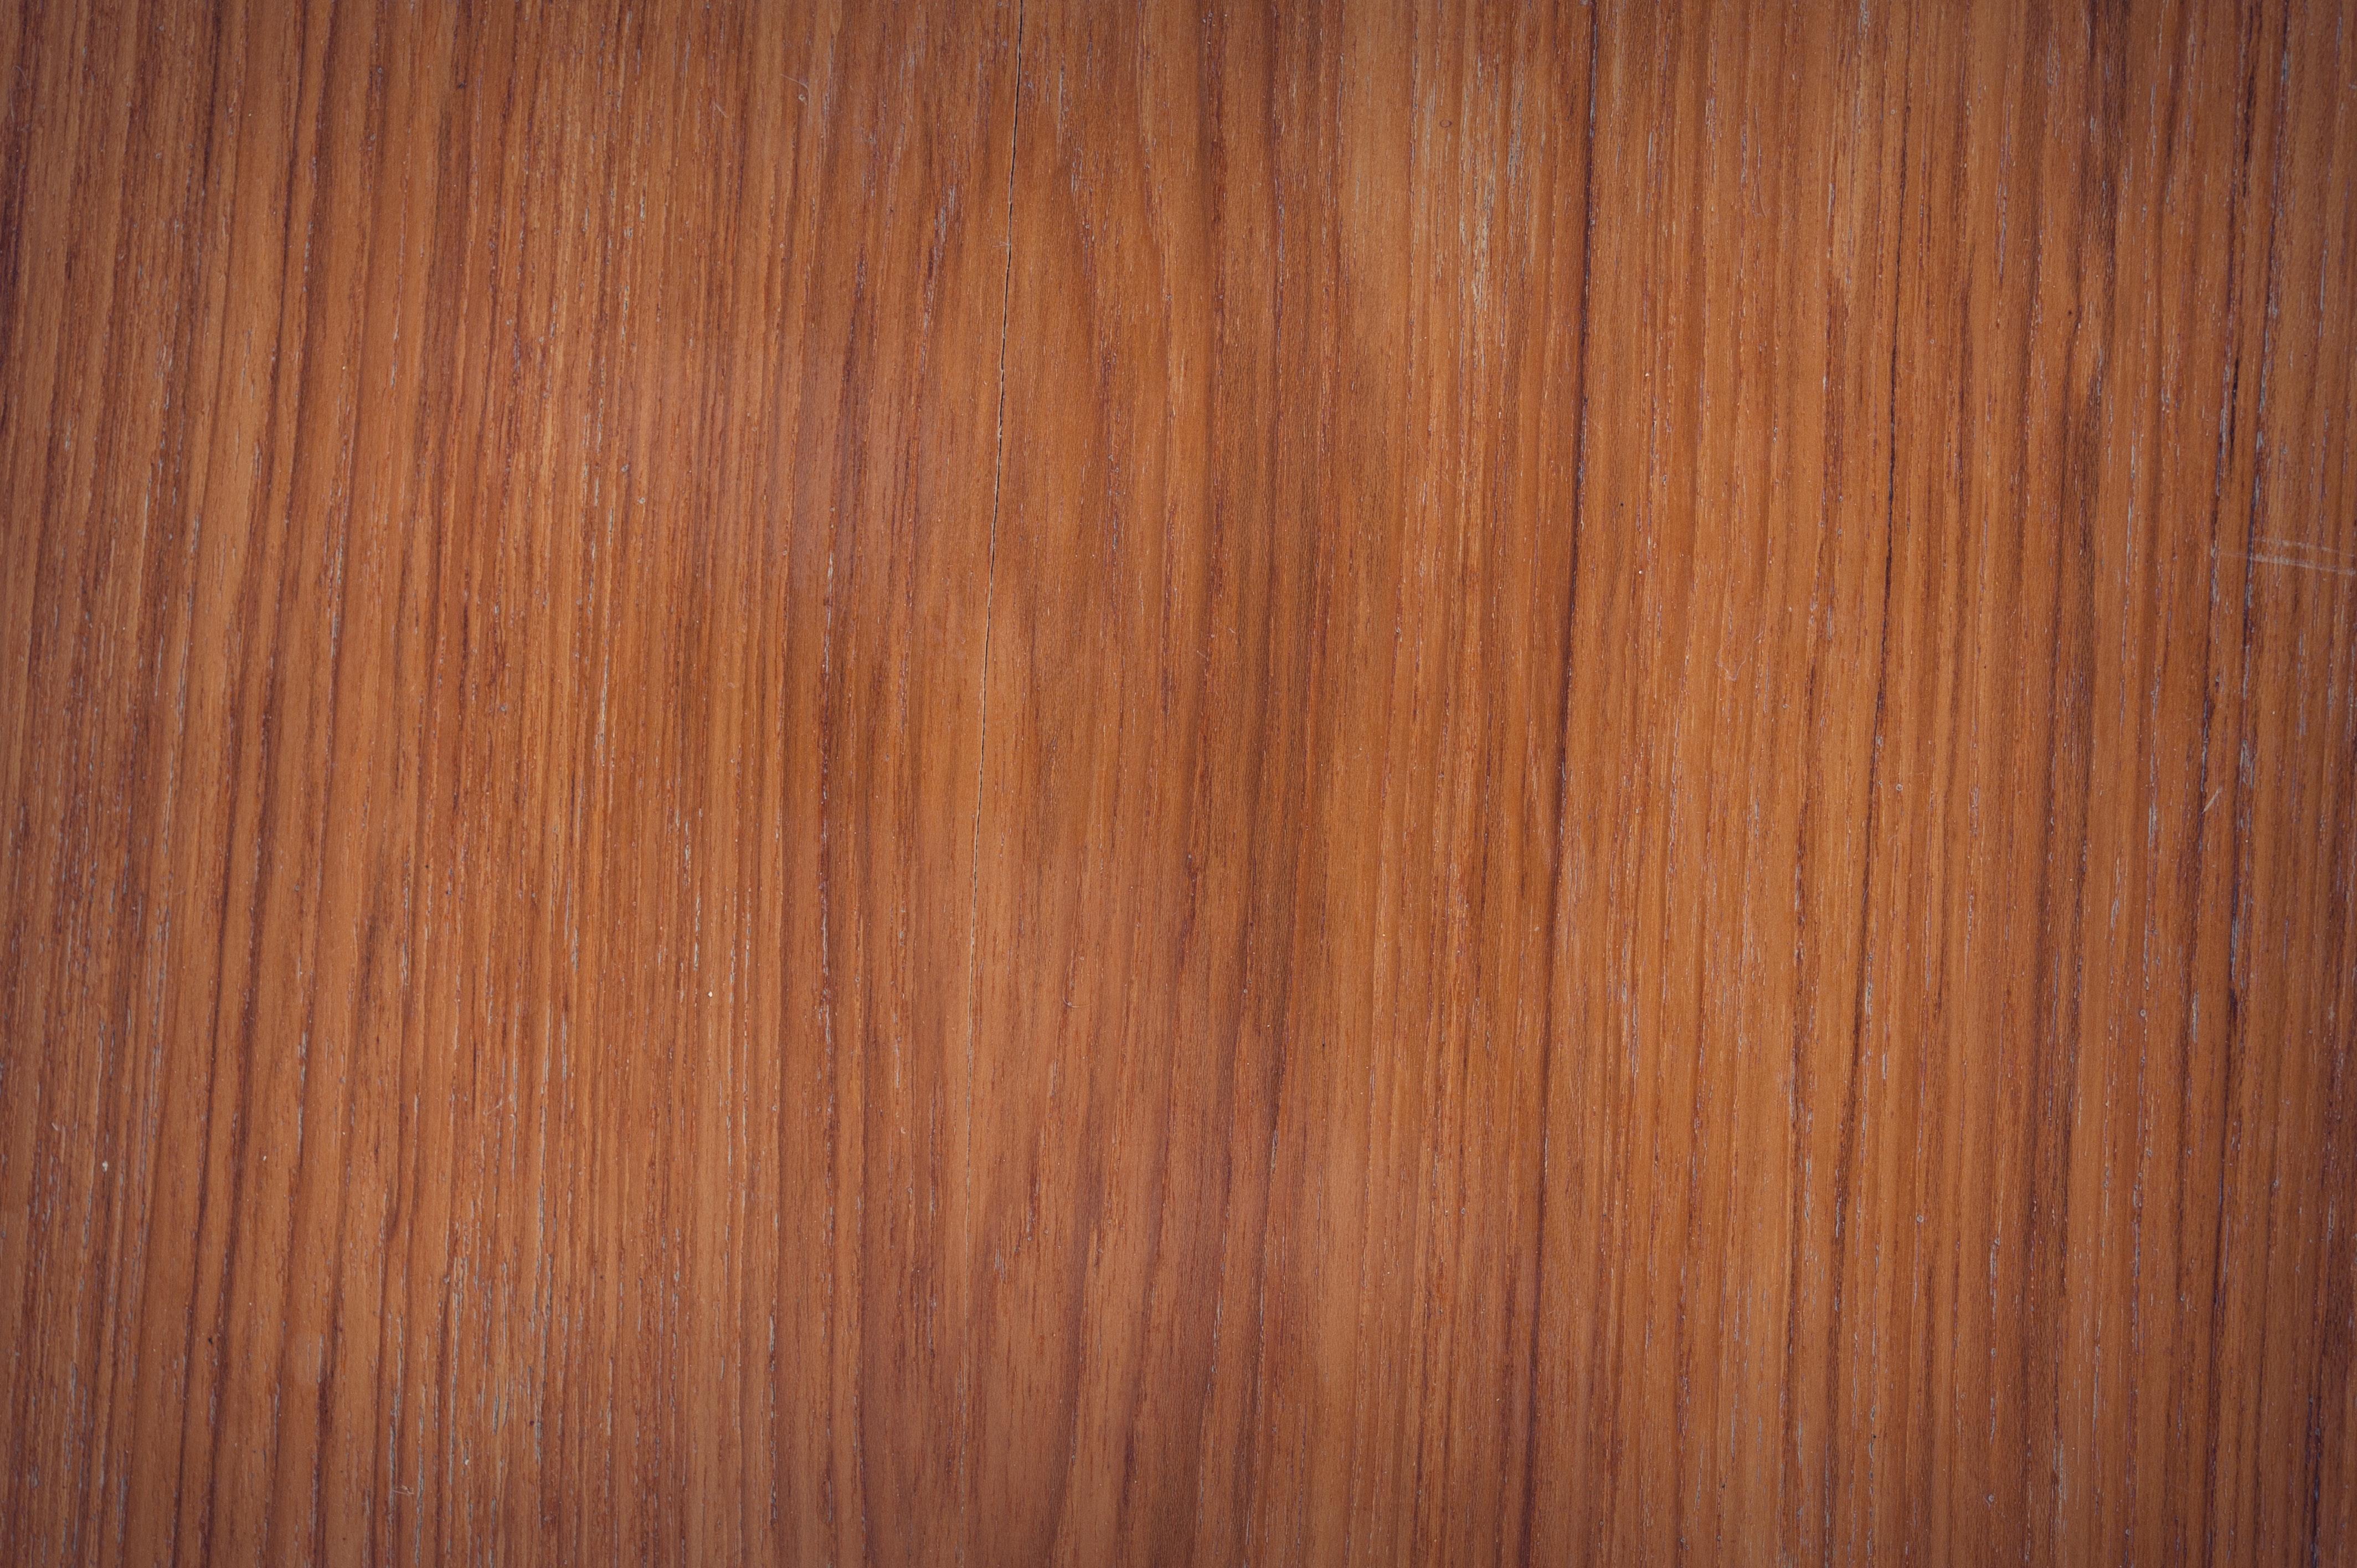 Wood Images · Pexels · Free Stock Photos